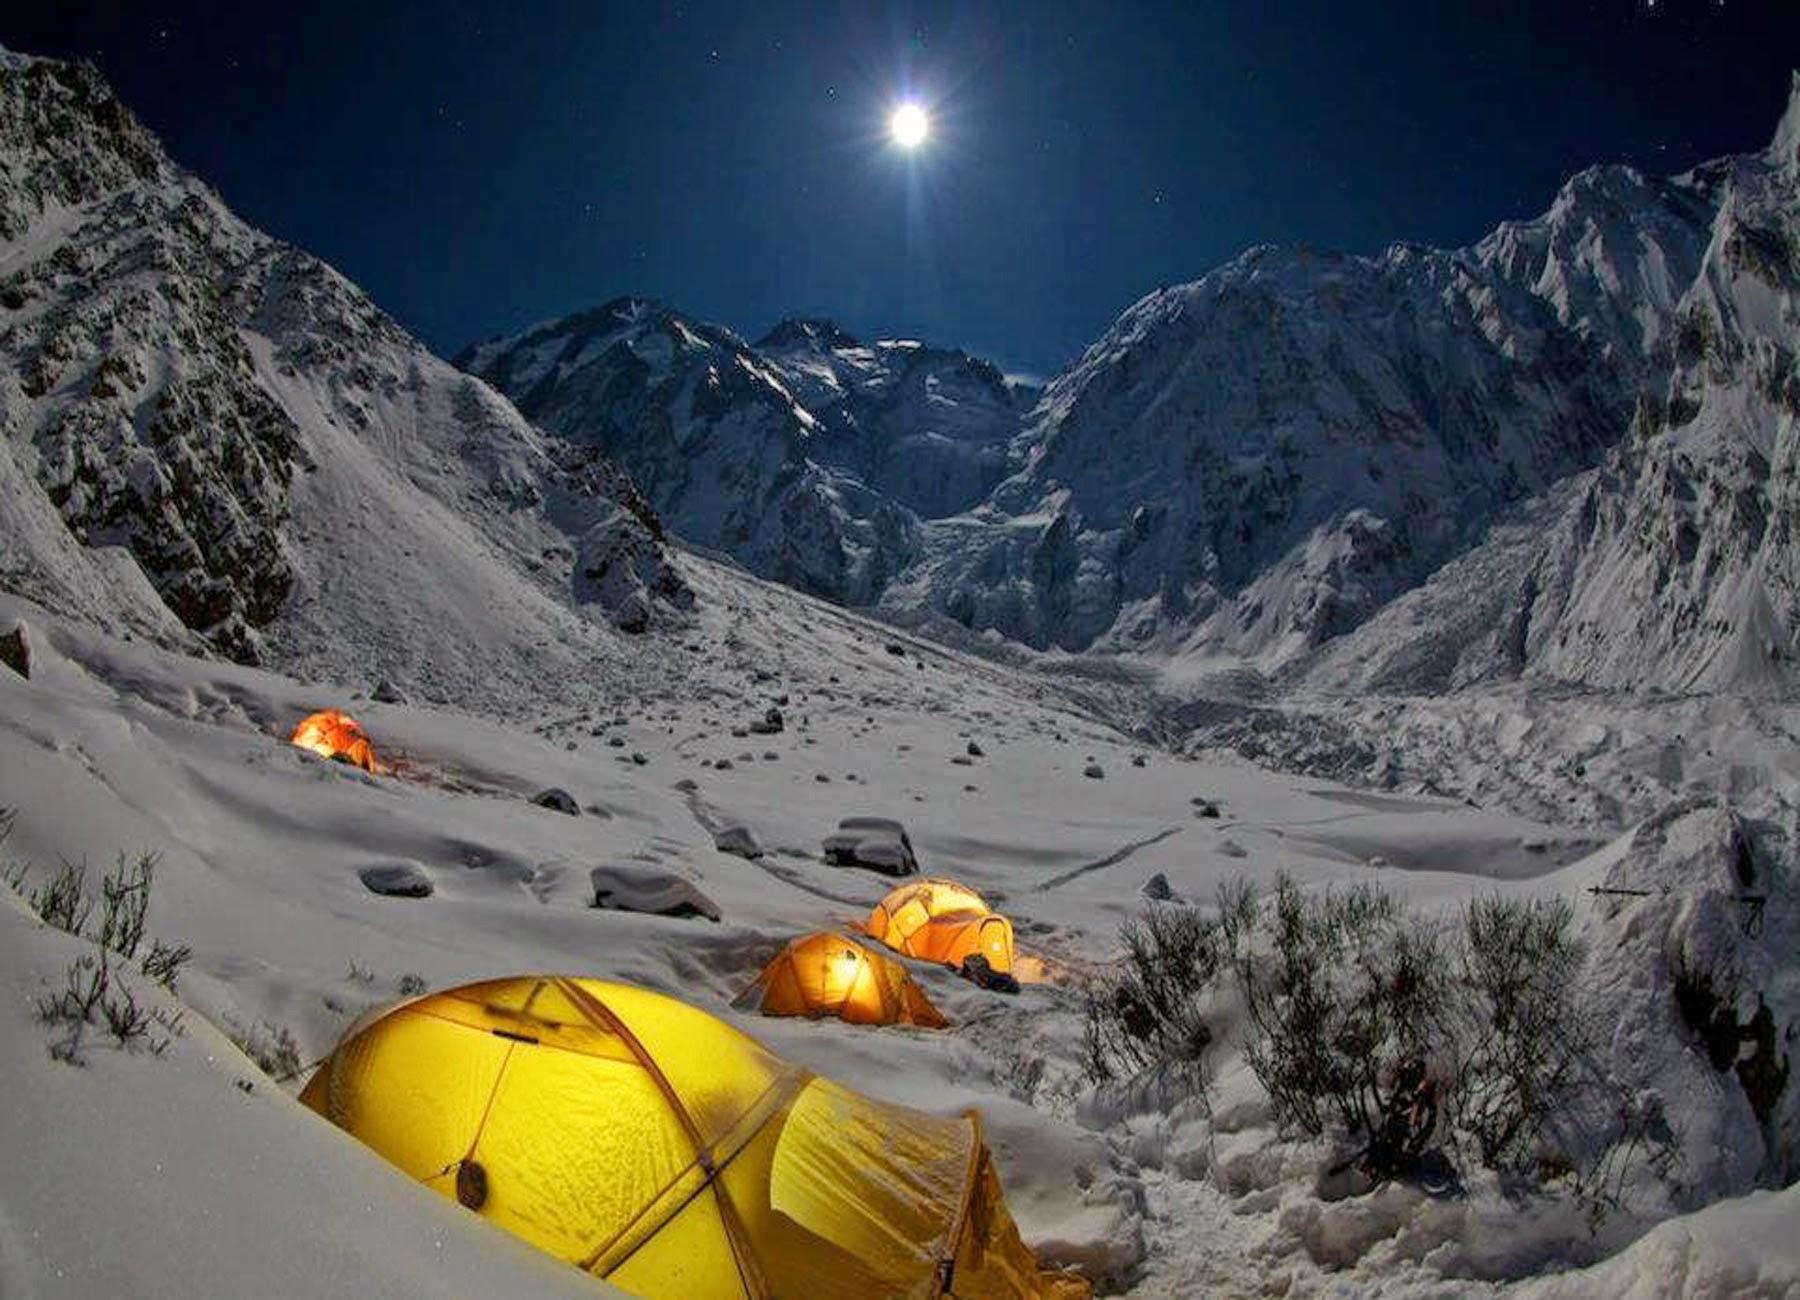 Vinterbestigning av Nanga Parbat underveis